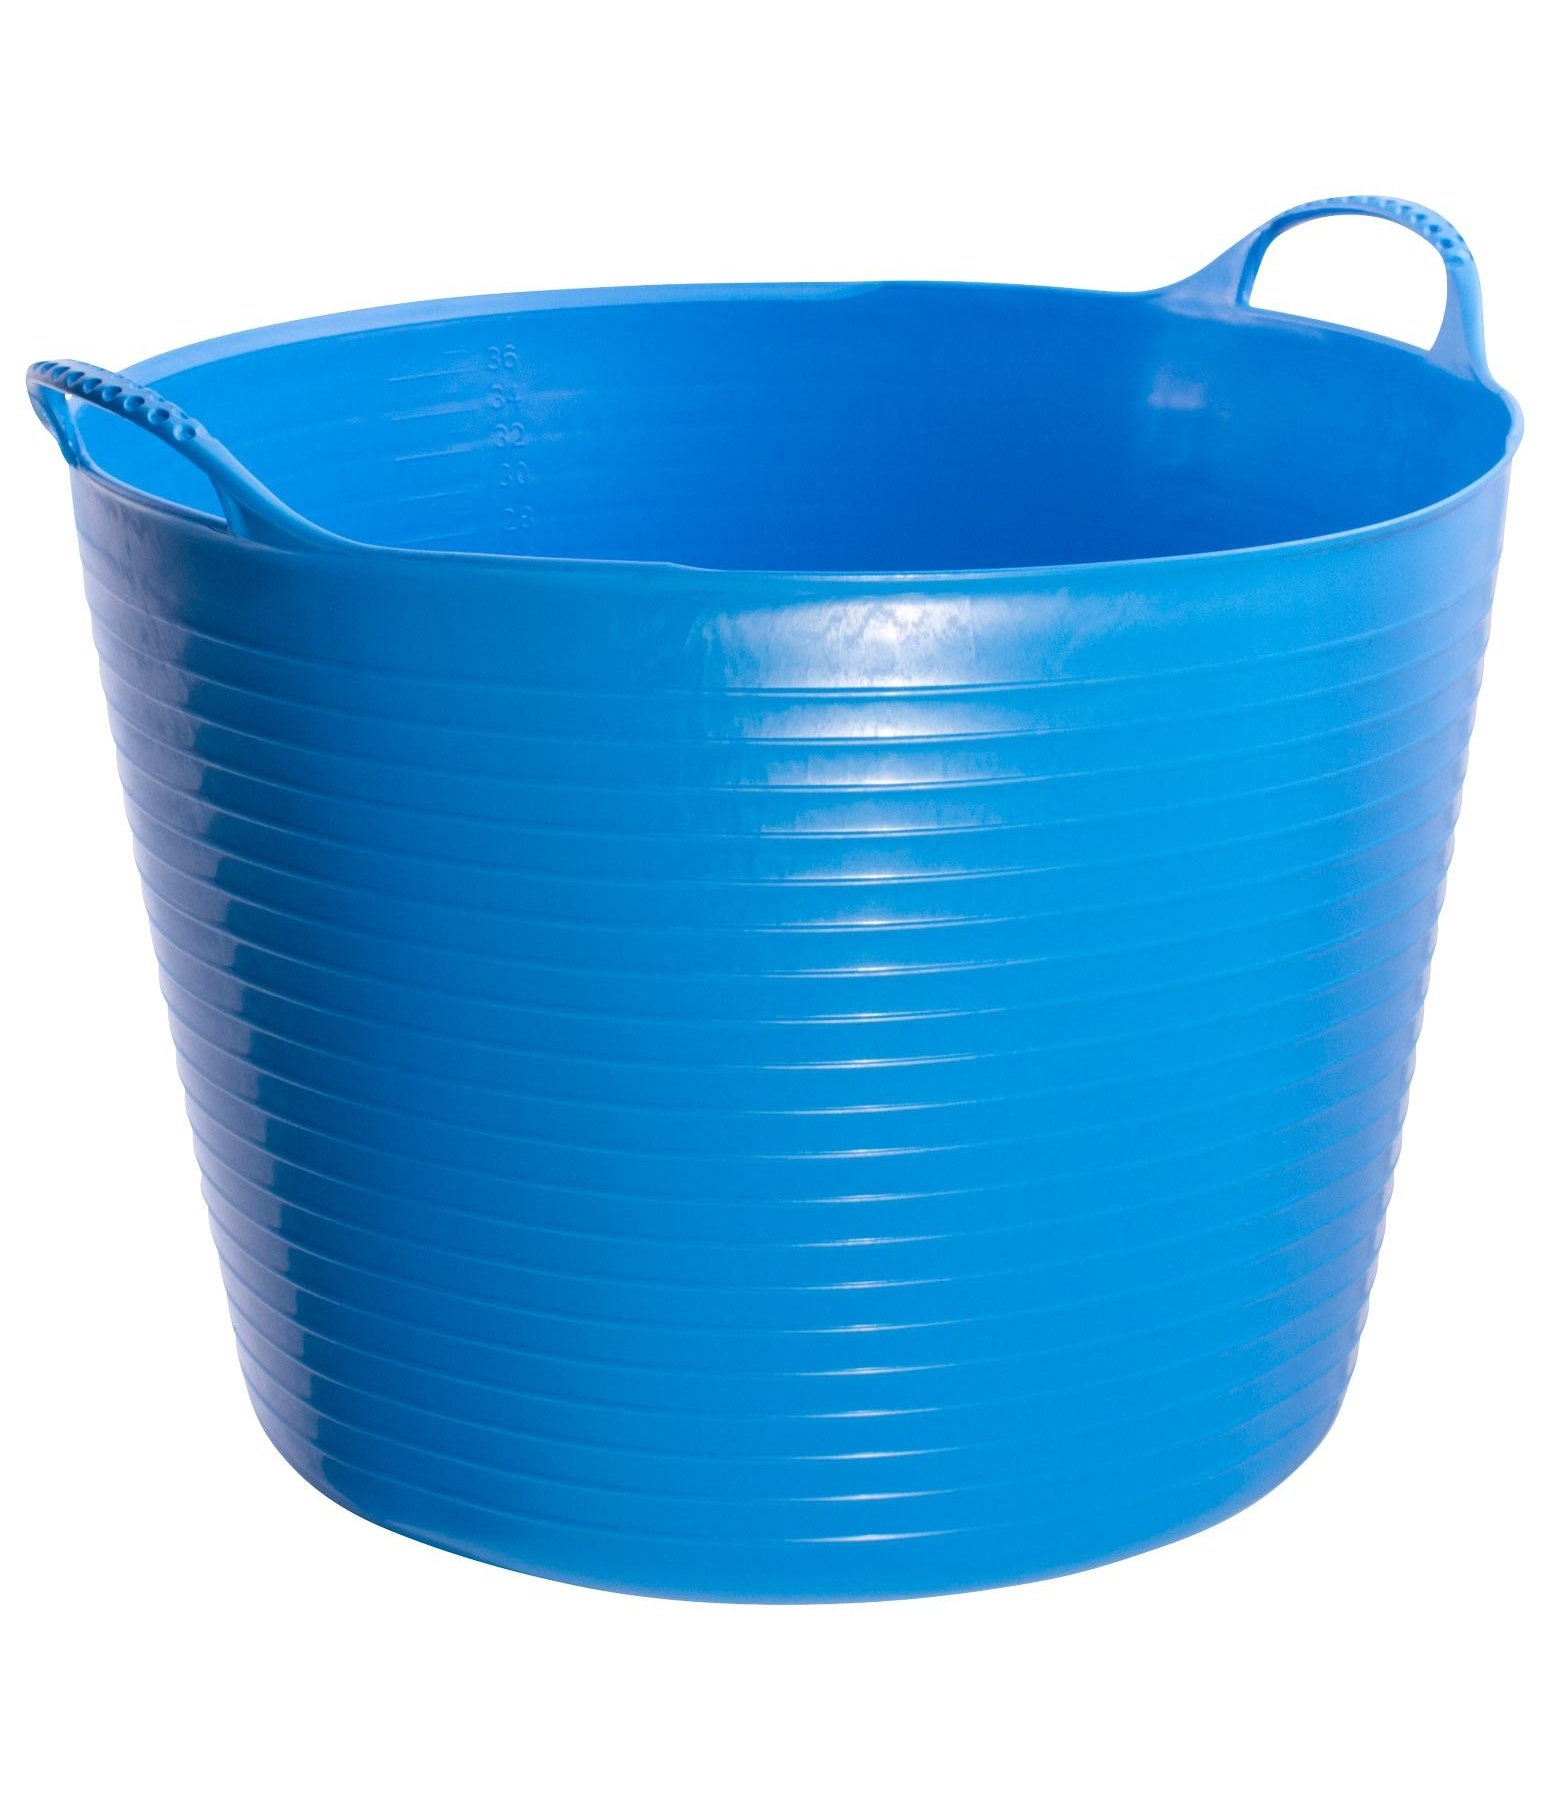 Red Gorilla Flexible Feed Tub Large - Buckets & Mangers - Kramer ...